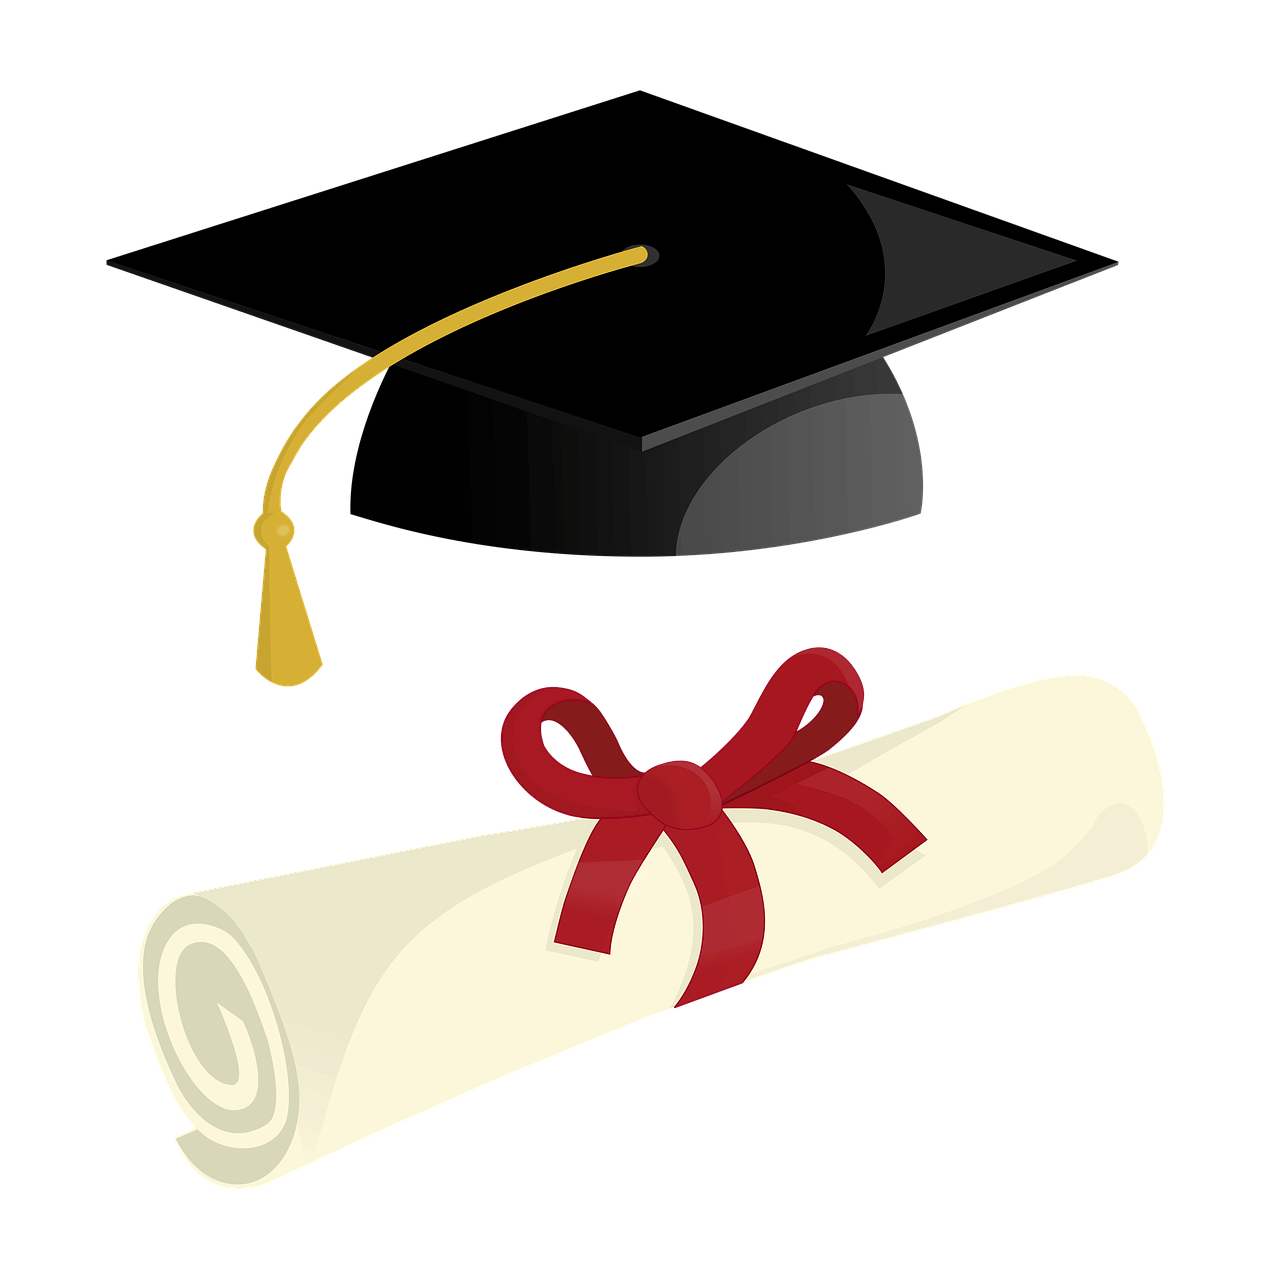 a diploma and a cap